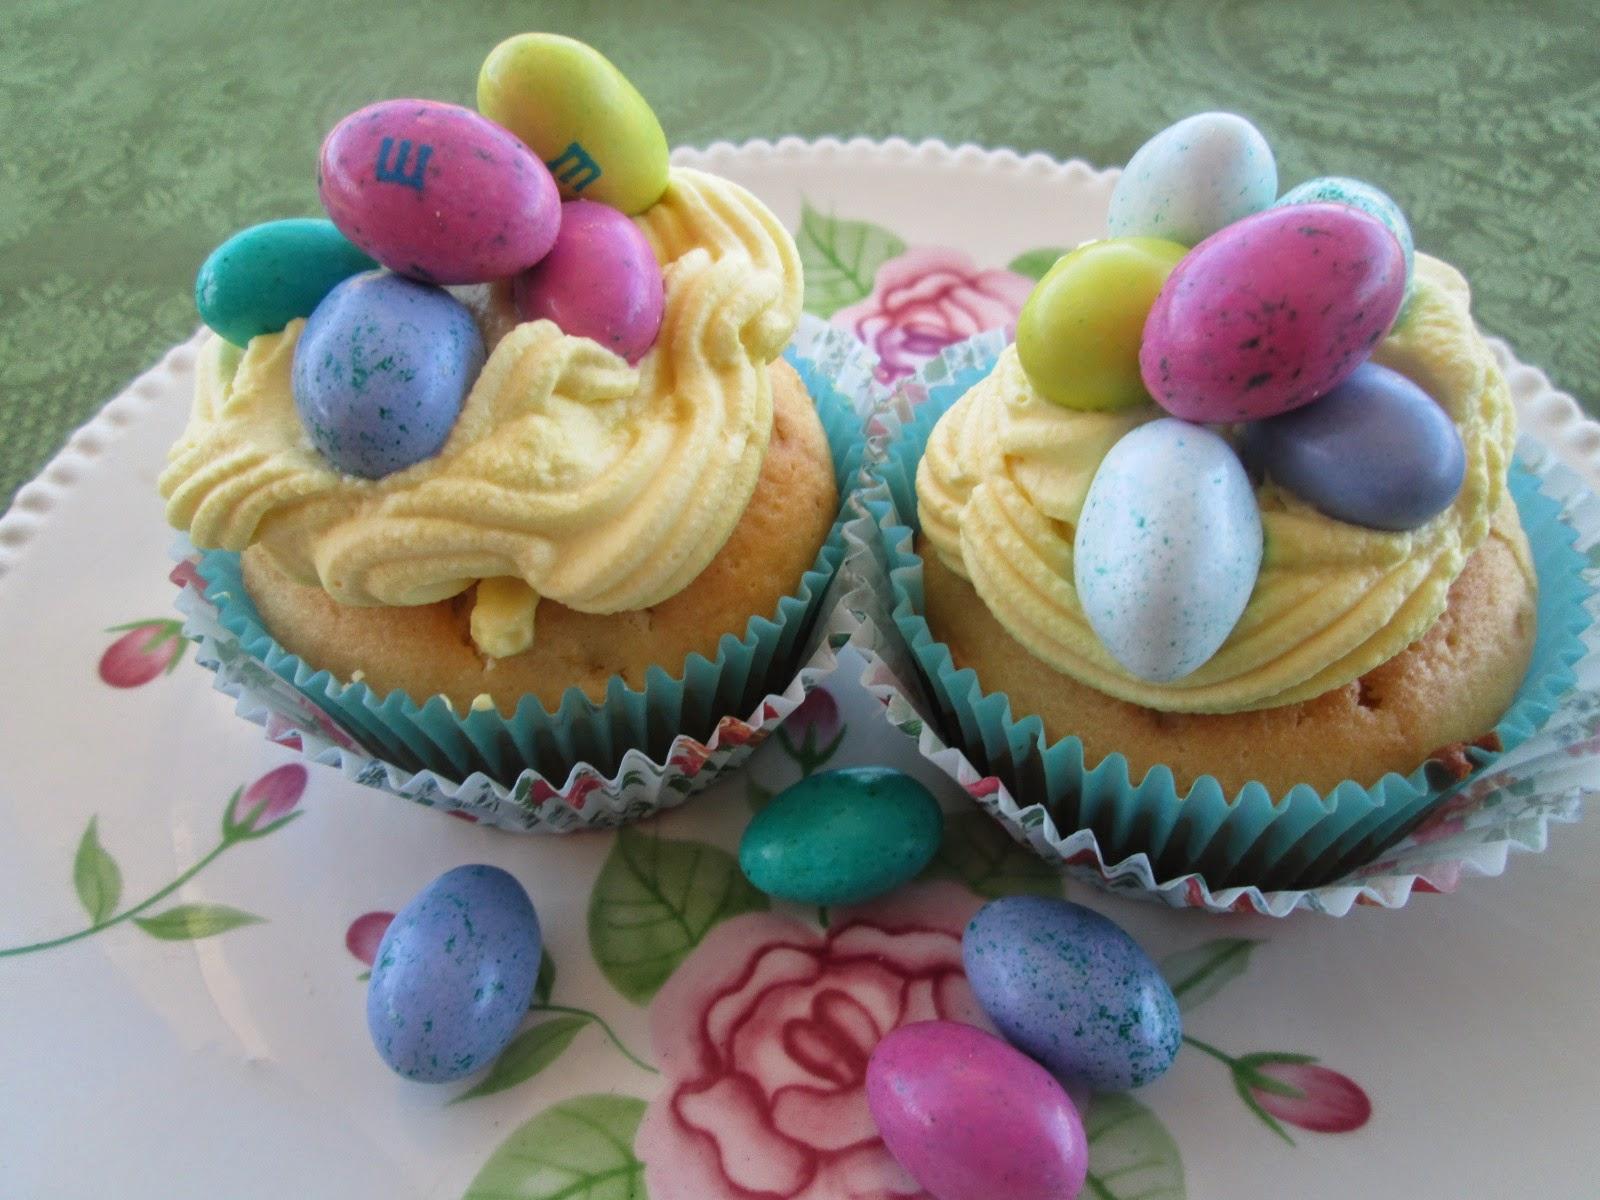 easter cupcakes with lemon curd (cupcakes de pascua con lemon curd)